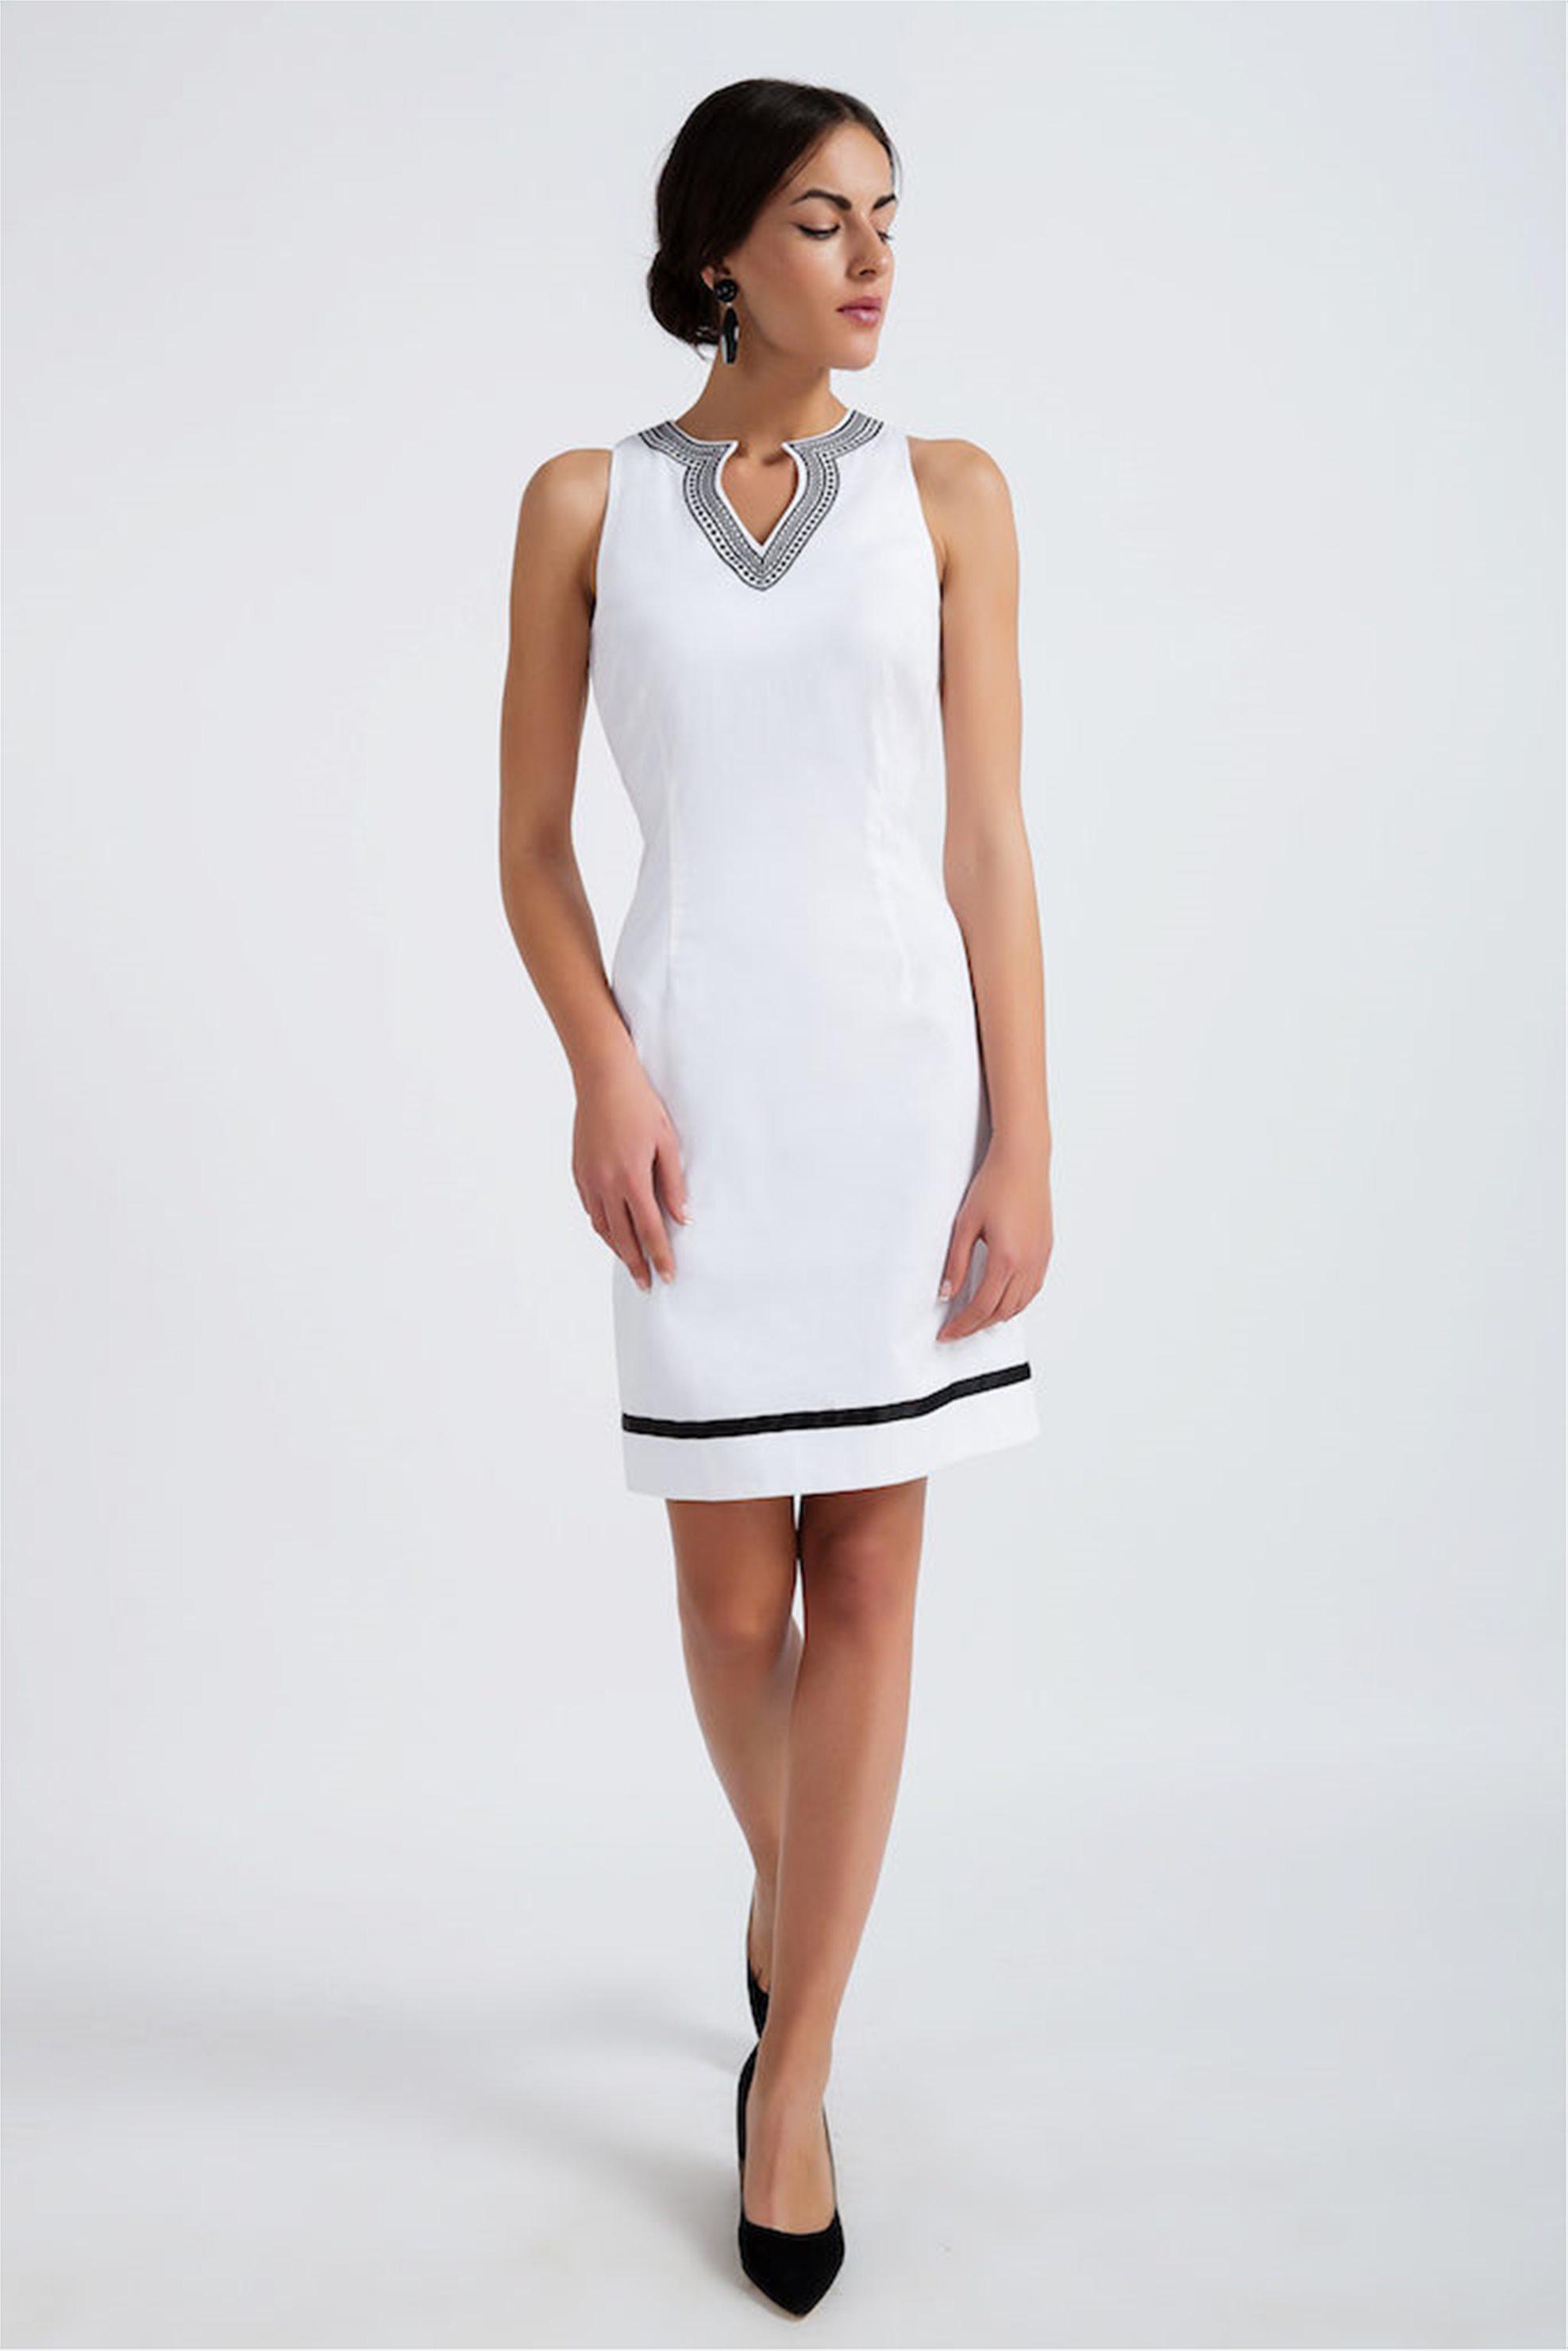 d93fbdb8931a Γυναικεία   Ρούχα   Φορέματα   Καθημερινά   Γυναικείο φόρεμα δαντέλα ...